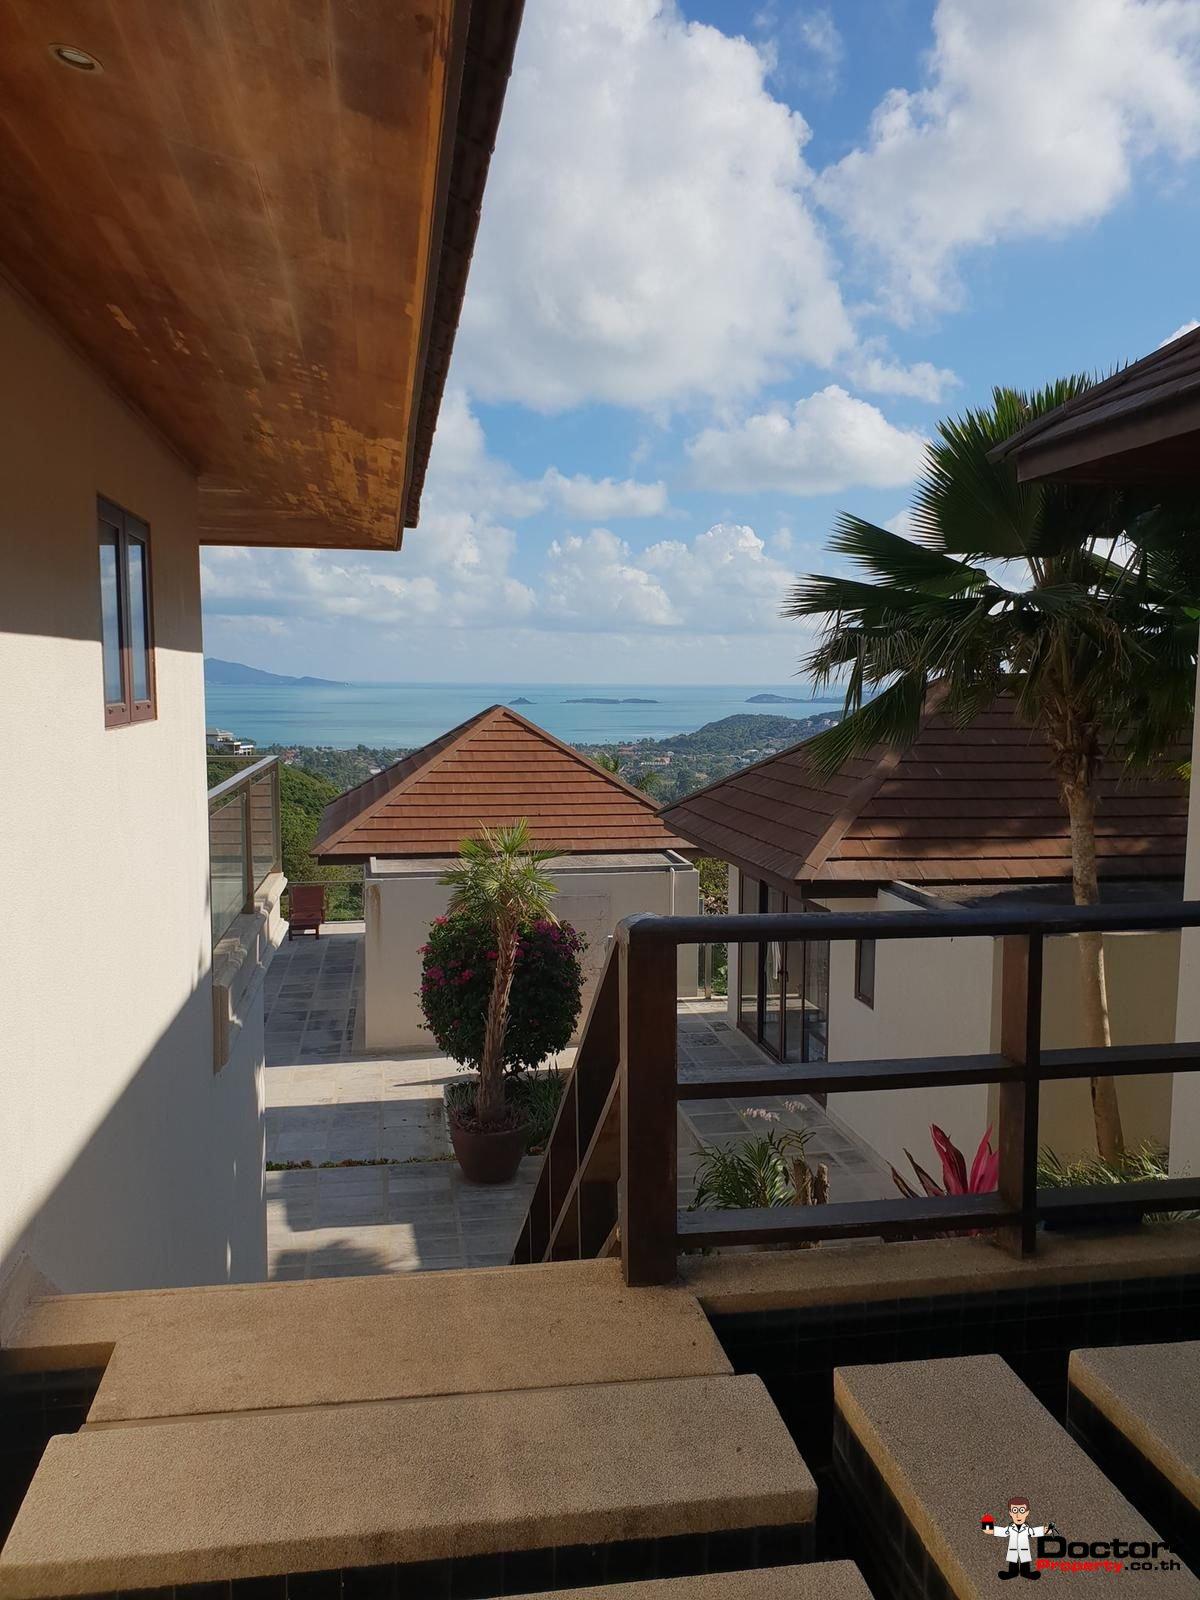 6 Bedroom Villa with Sea View - Bophut - Koh Samui - for sale 15